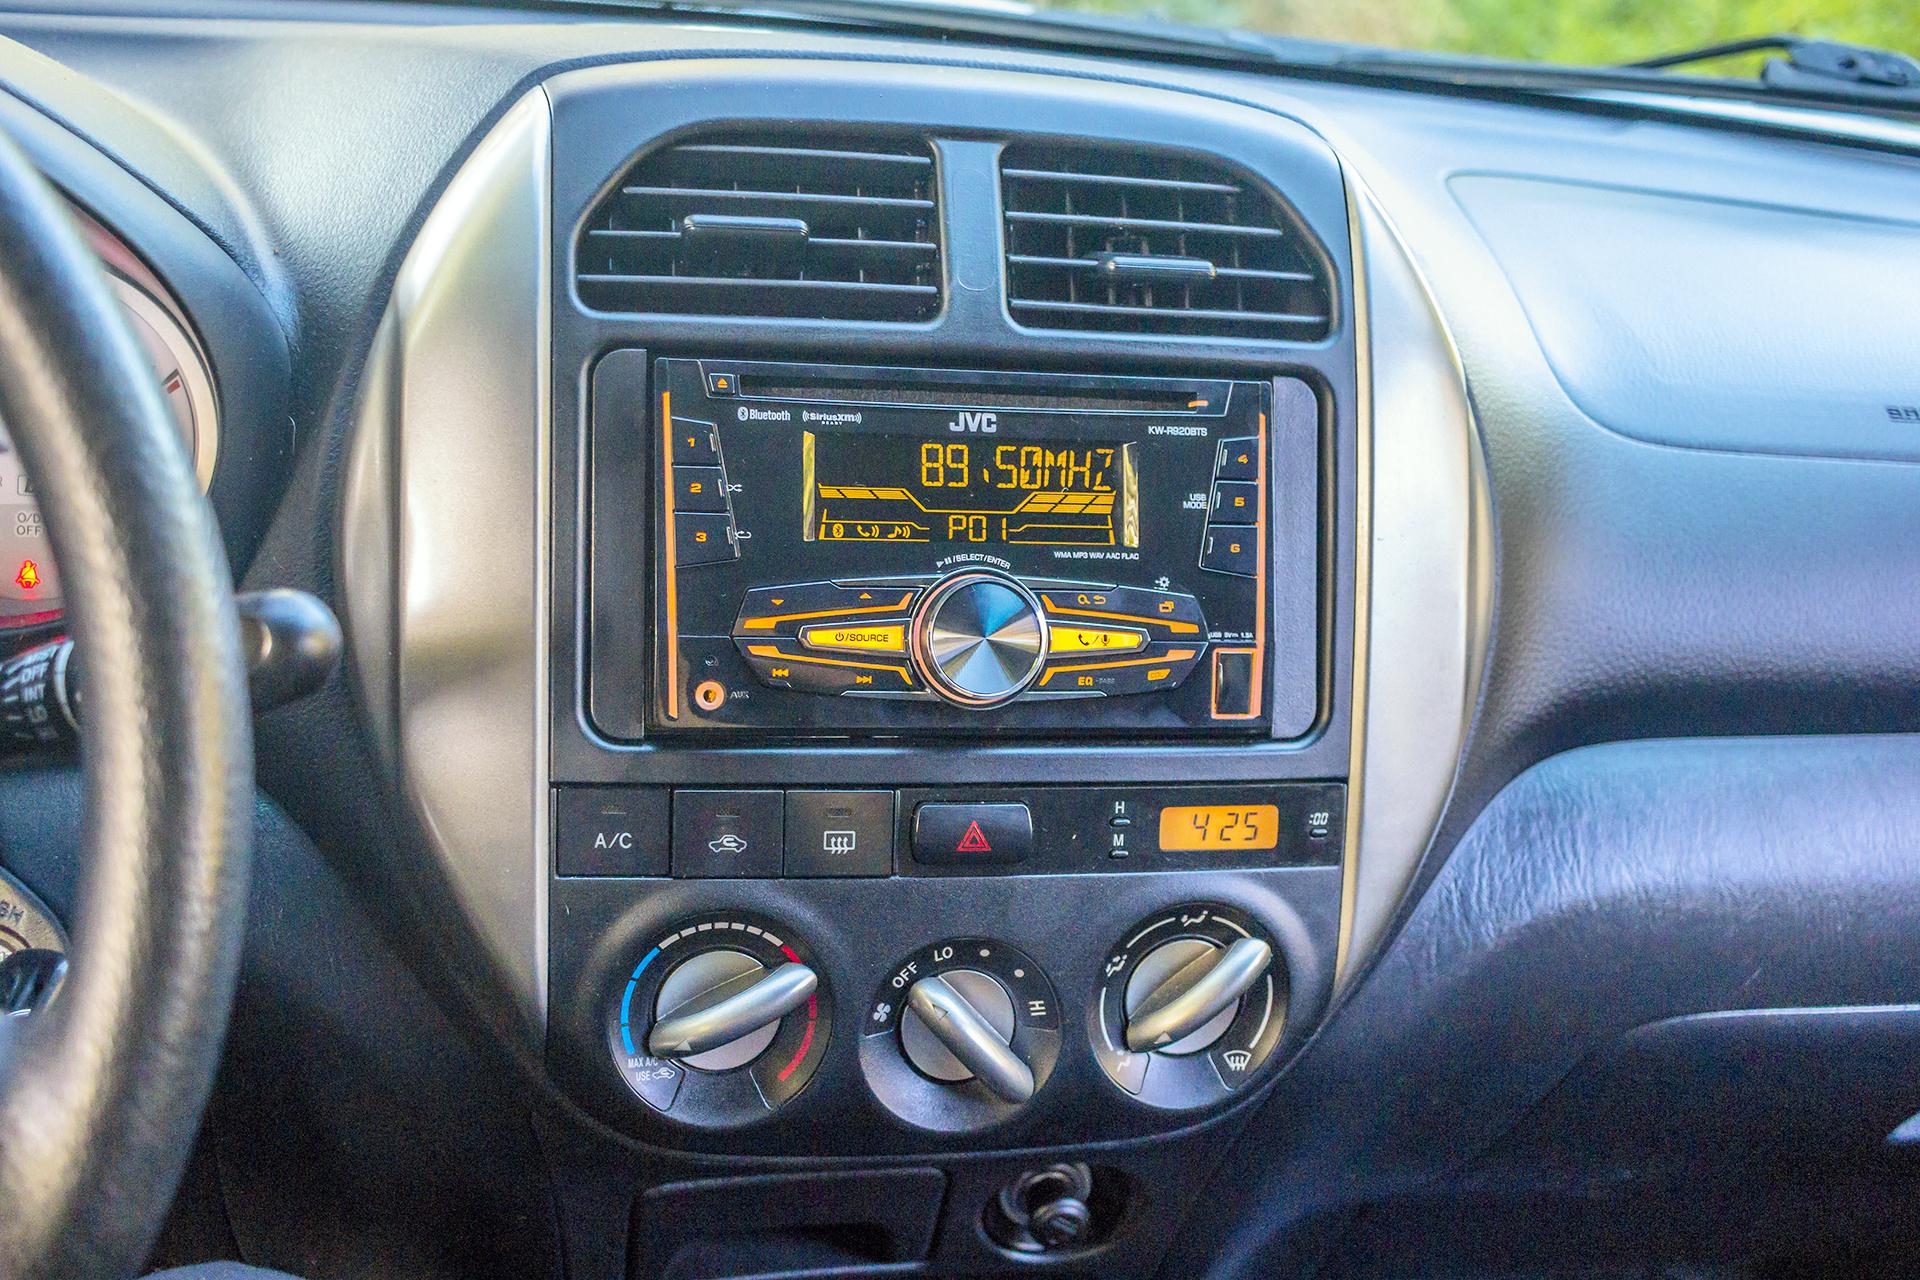 This 2004 Toyota RAV4 had us install a new JVC Radio